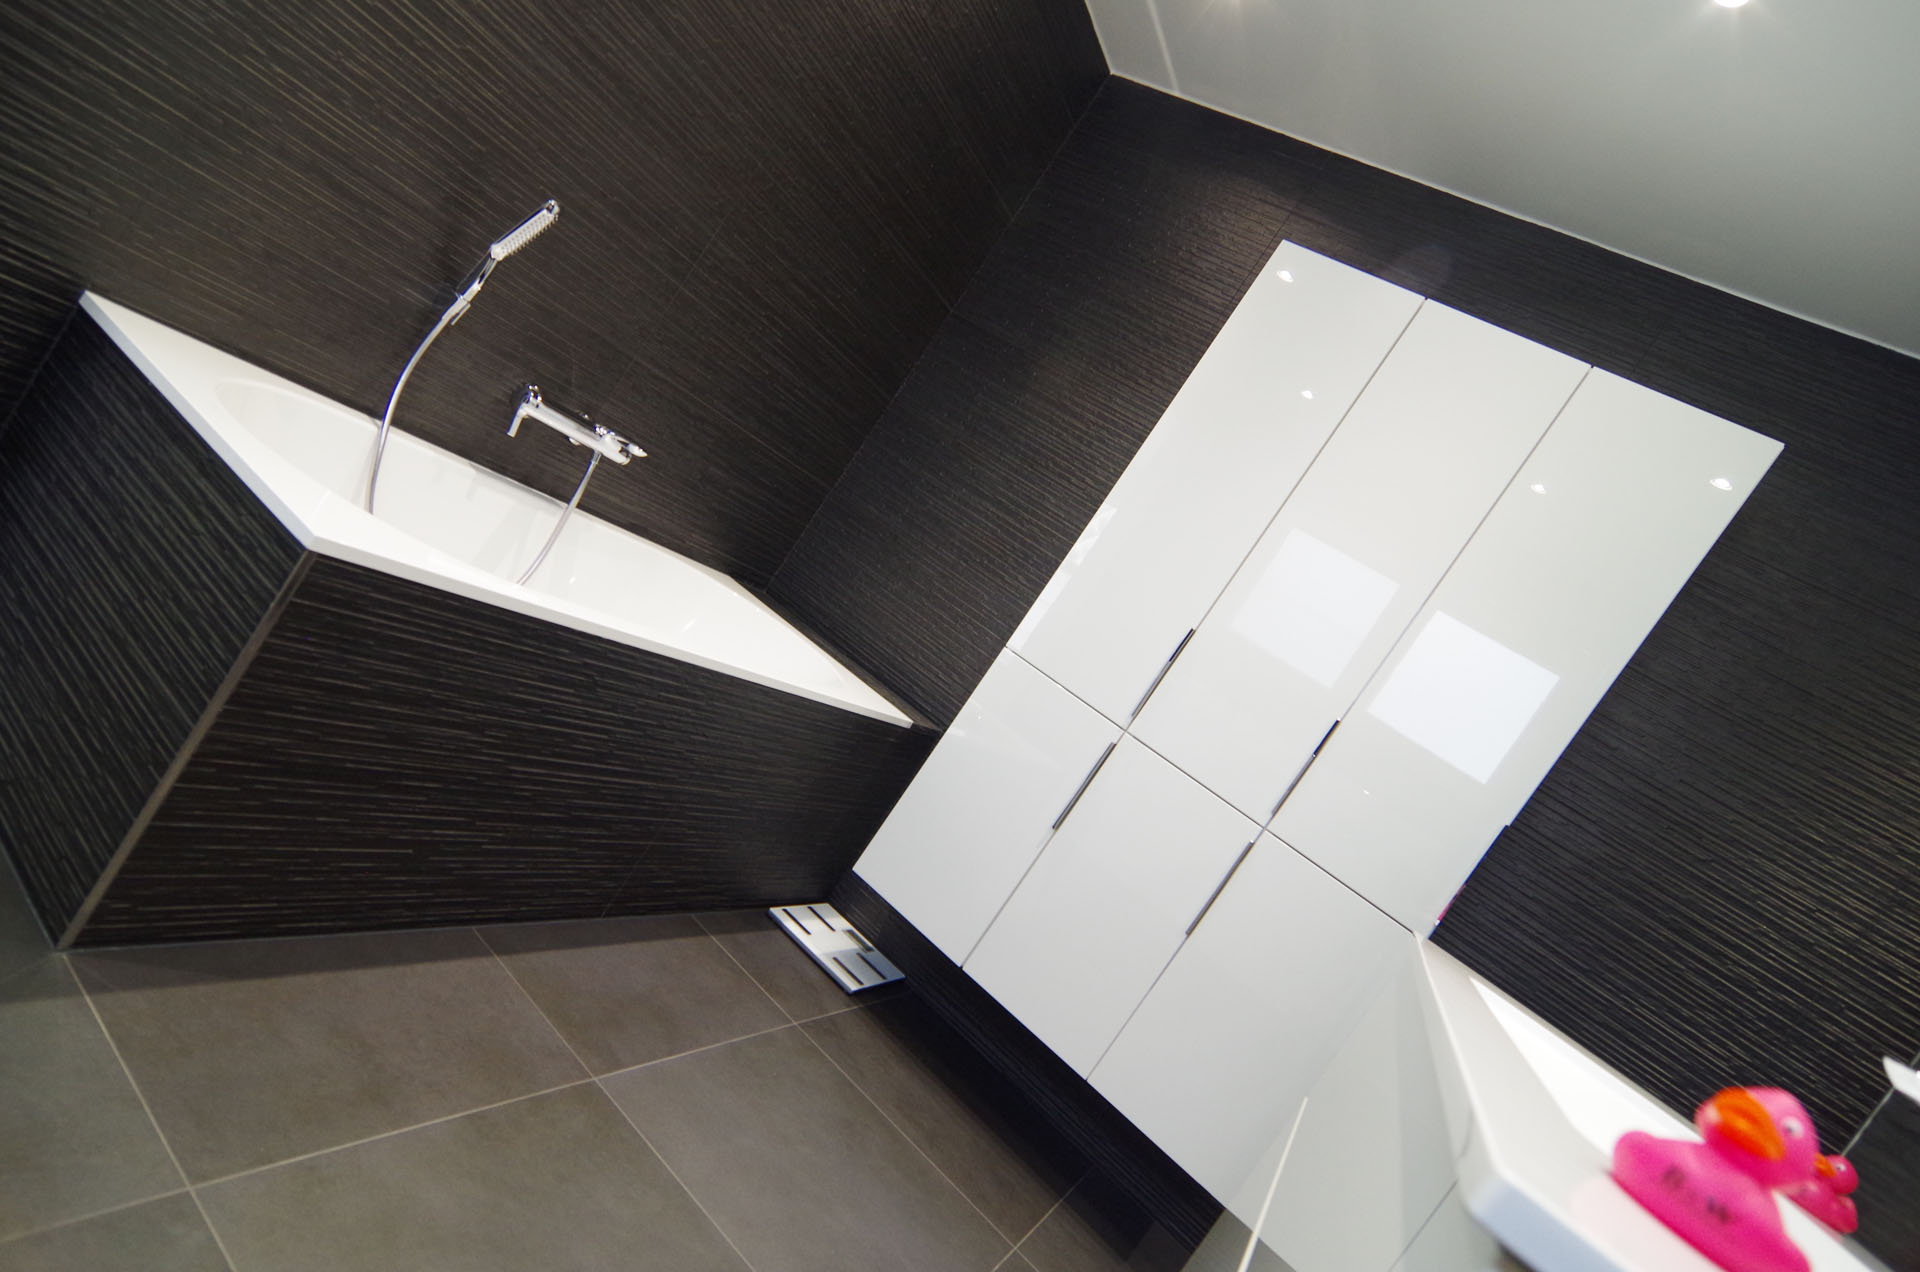 B&W Badkamers | Badkamers en badkamerrenovatie in Heist-op-den-Berg | Moderne zwart-wit badkamer